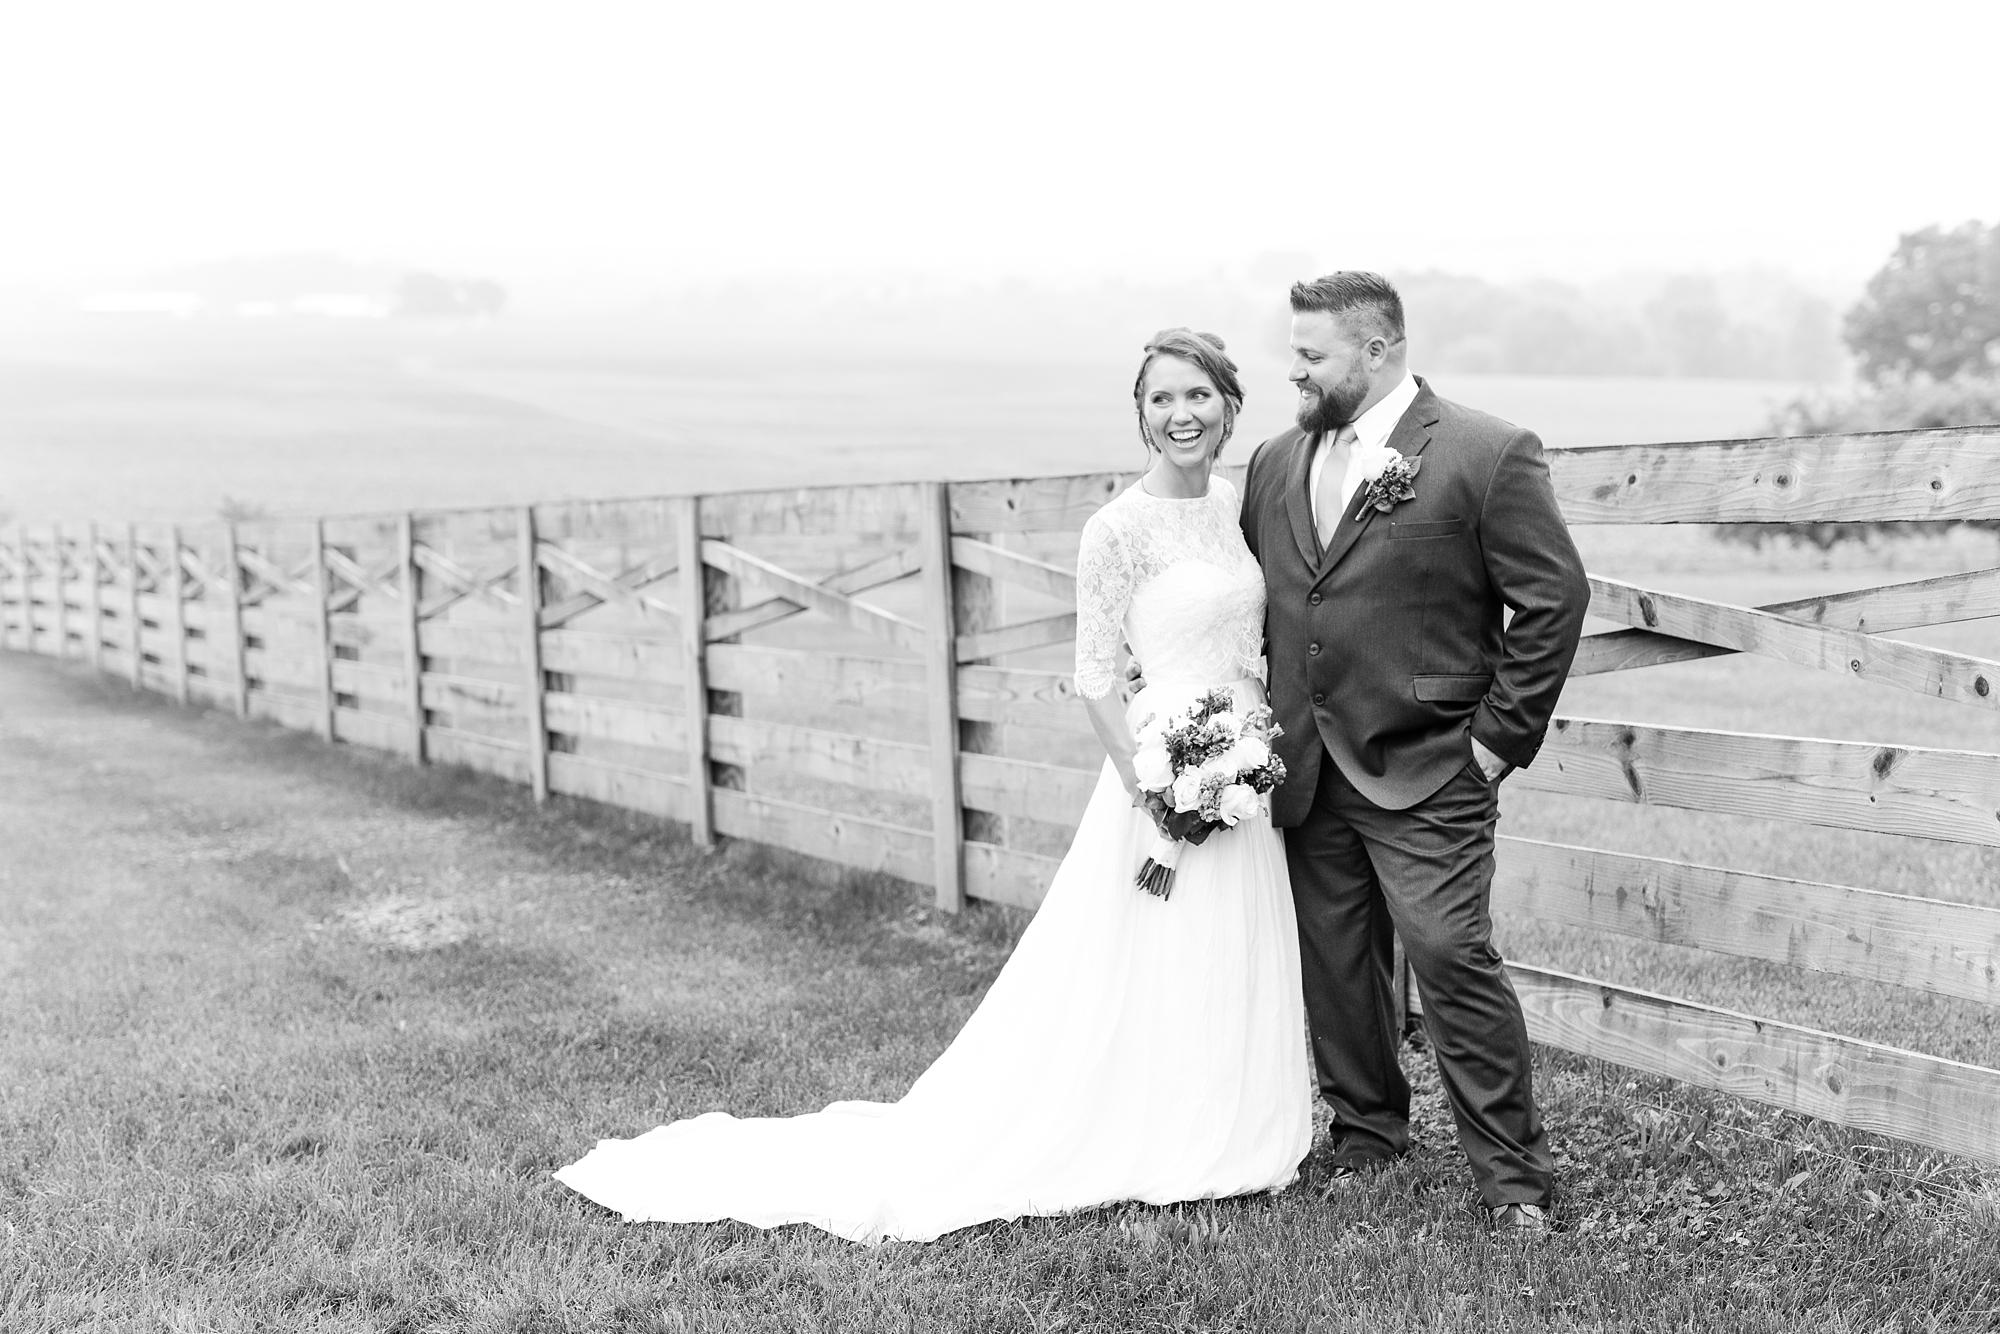 walkerton overlook maryland wedding venue_2794